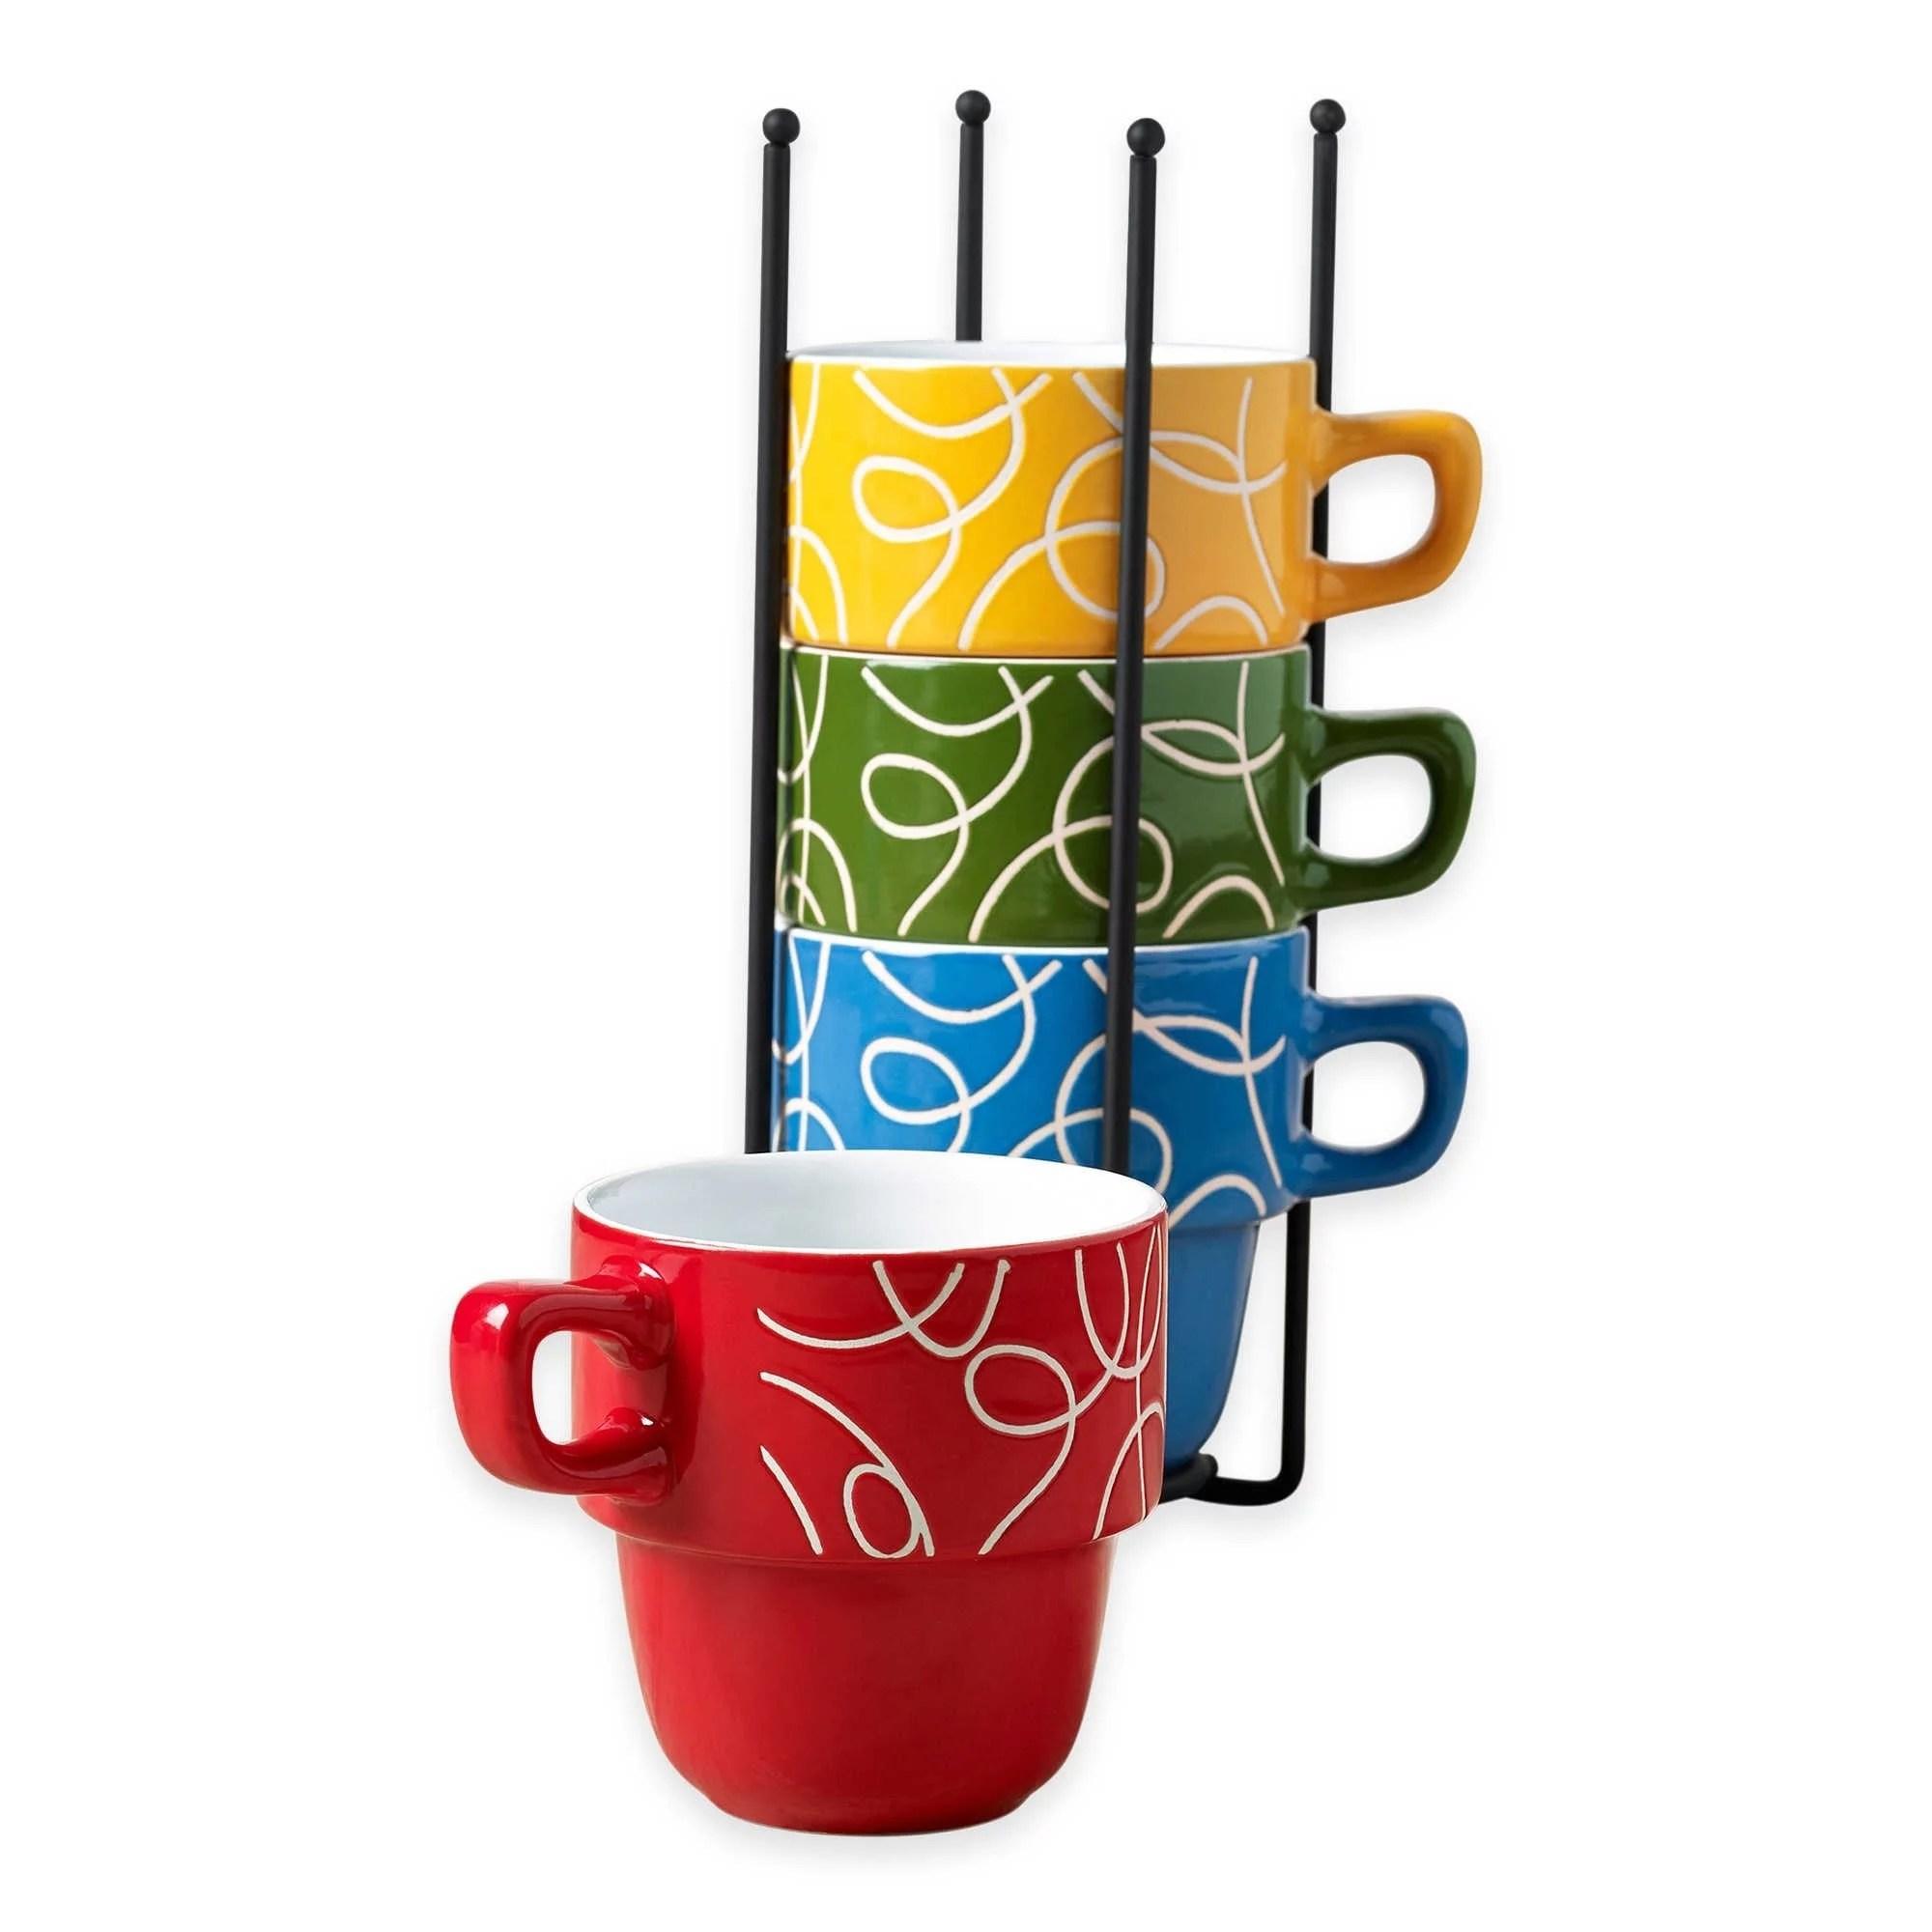 ceramic 5 pcs stacking coffee mug set with rack mugs with stand esto